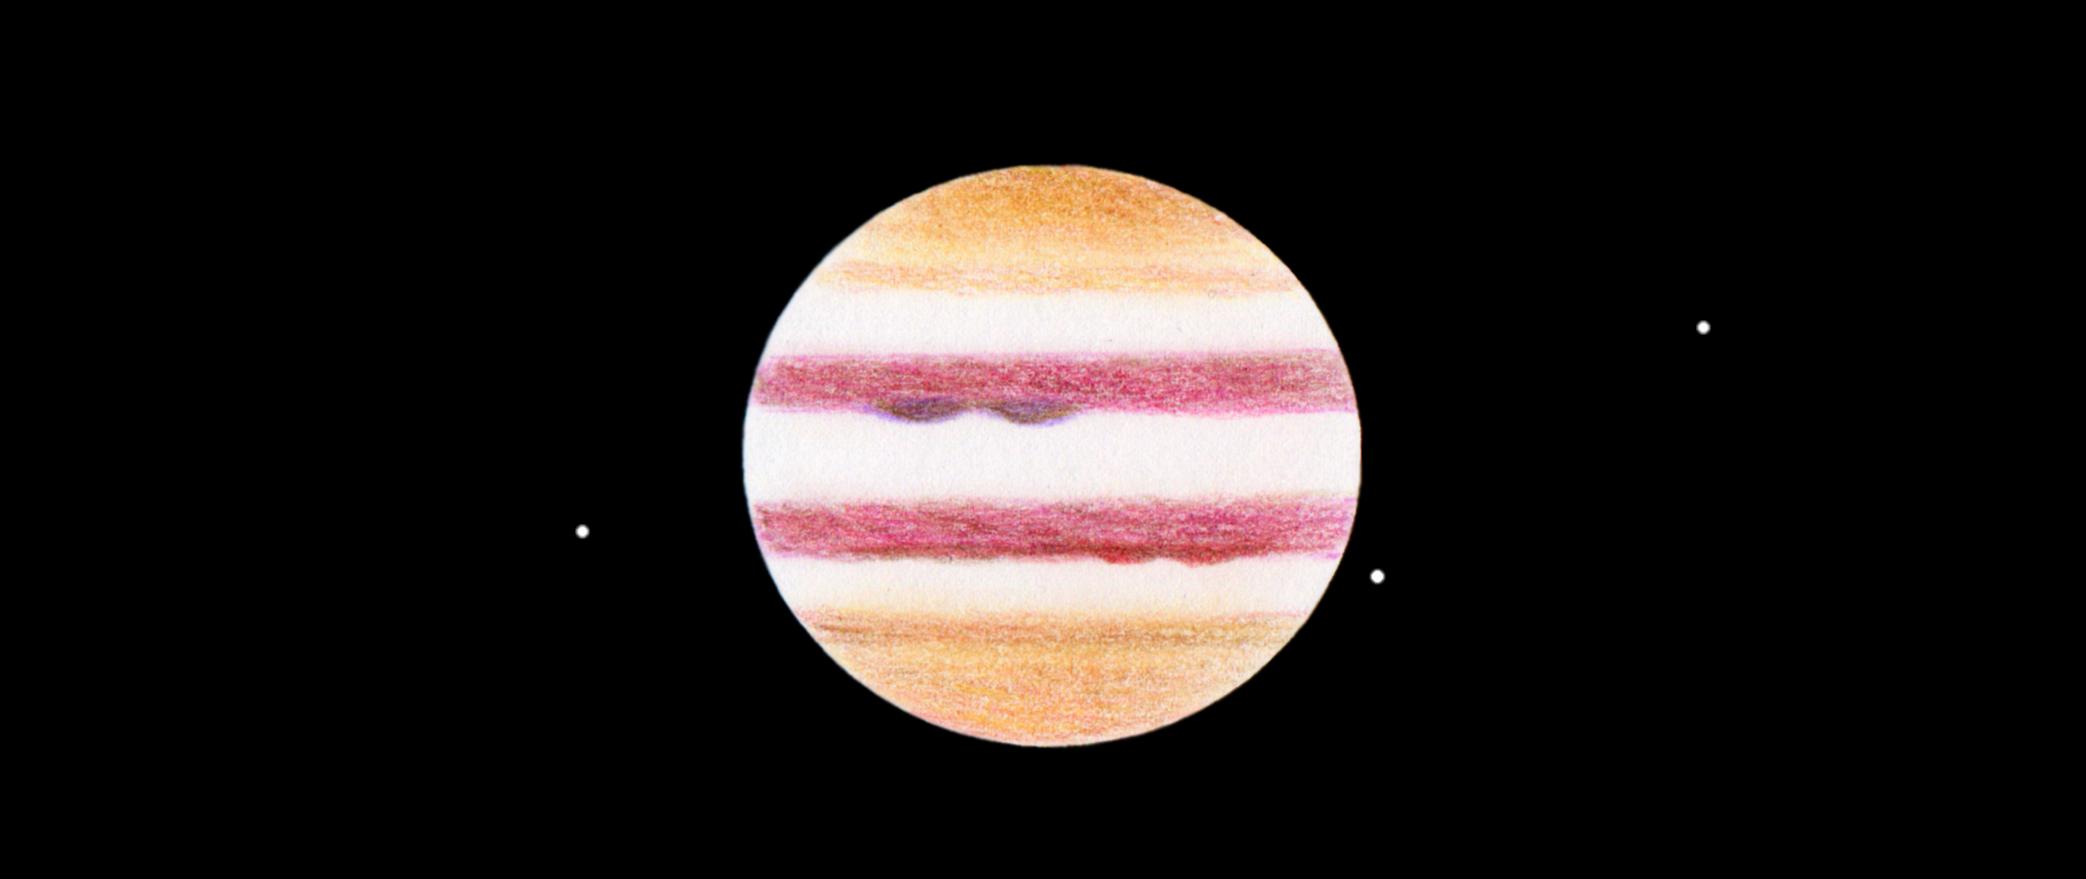 http://ekladata.com/Uc8-m8at-aRPQA8499lr0zcOSeA/Jupiter-21-02-2016-T150-0h15.png